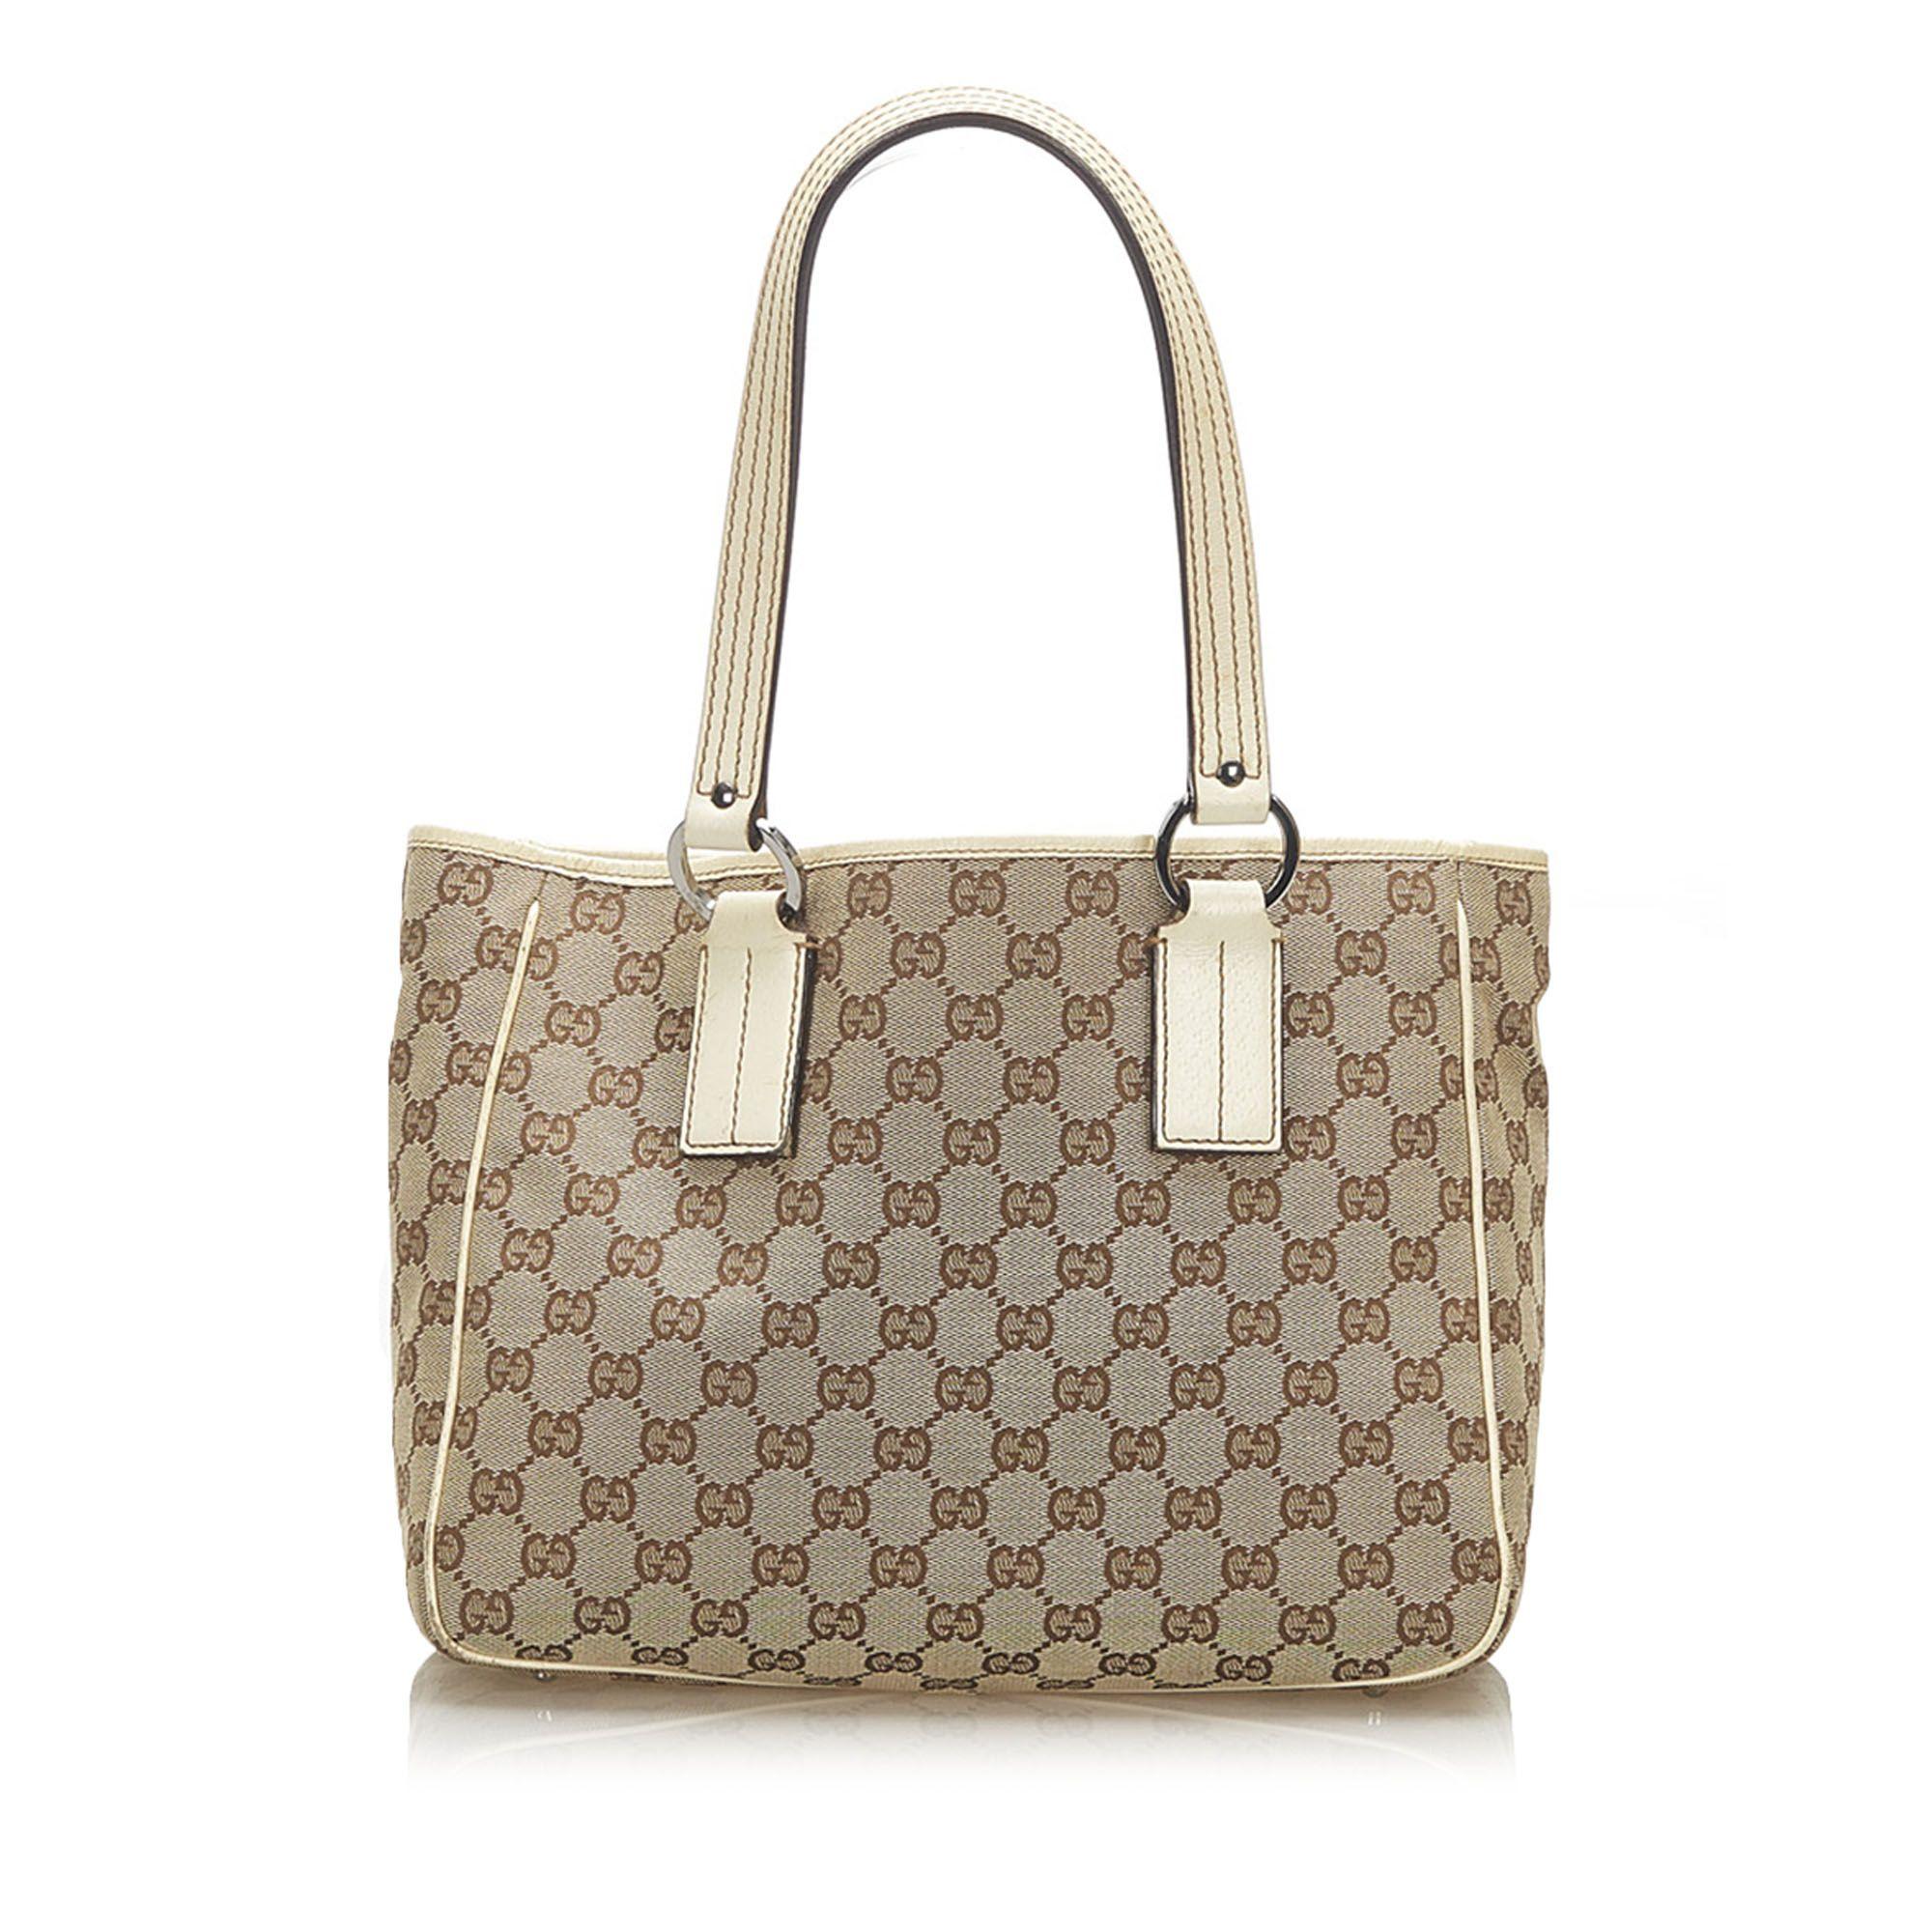 Vintage Gucci GG Canvas Tote Bag Brown